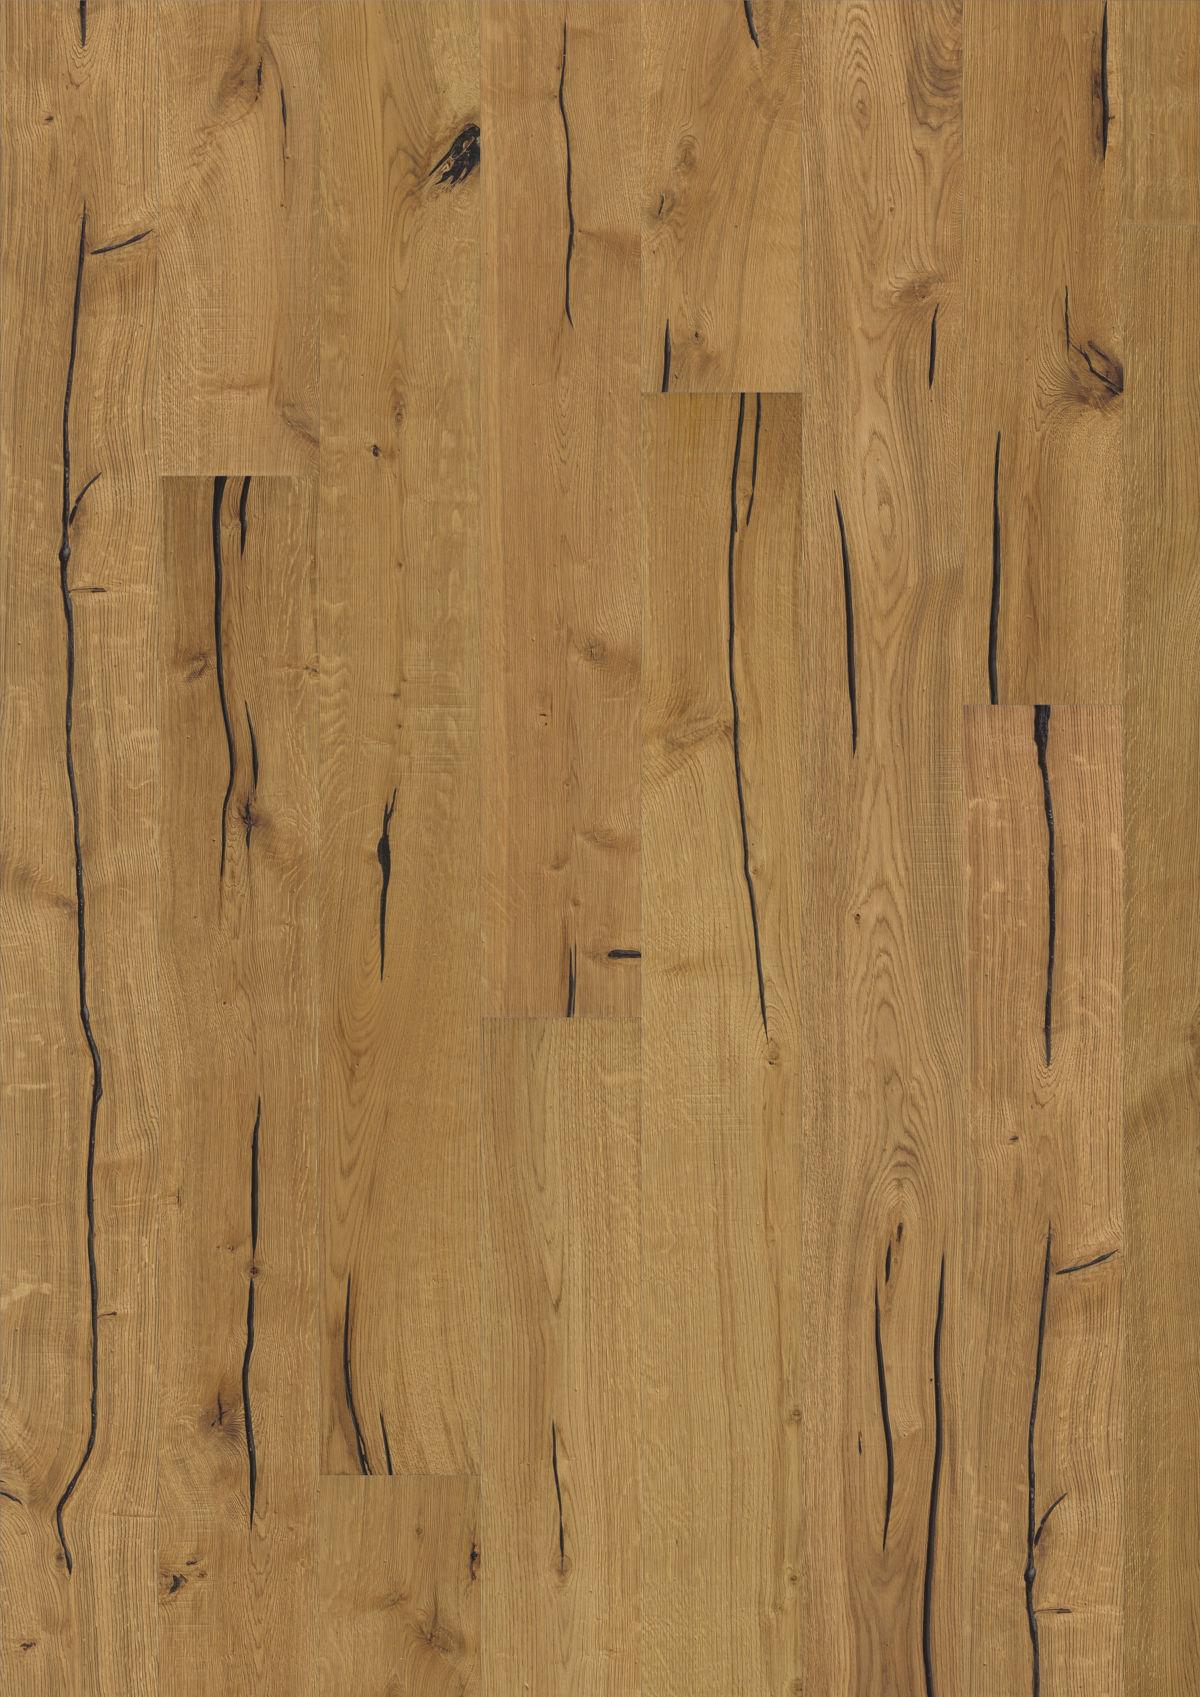 kahrs oak finnveden engineered wood flooring. Black Bedroom Furniture Sets. Home Design Ideas